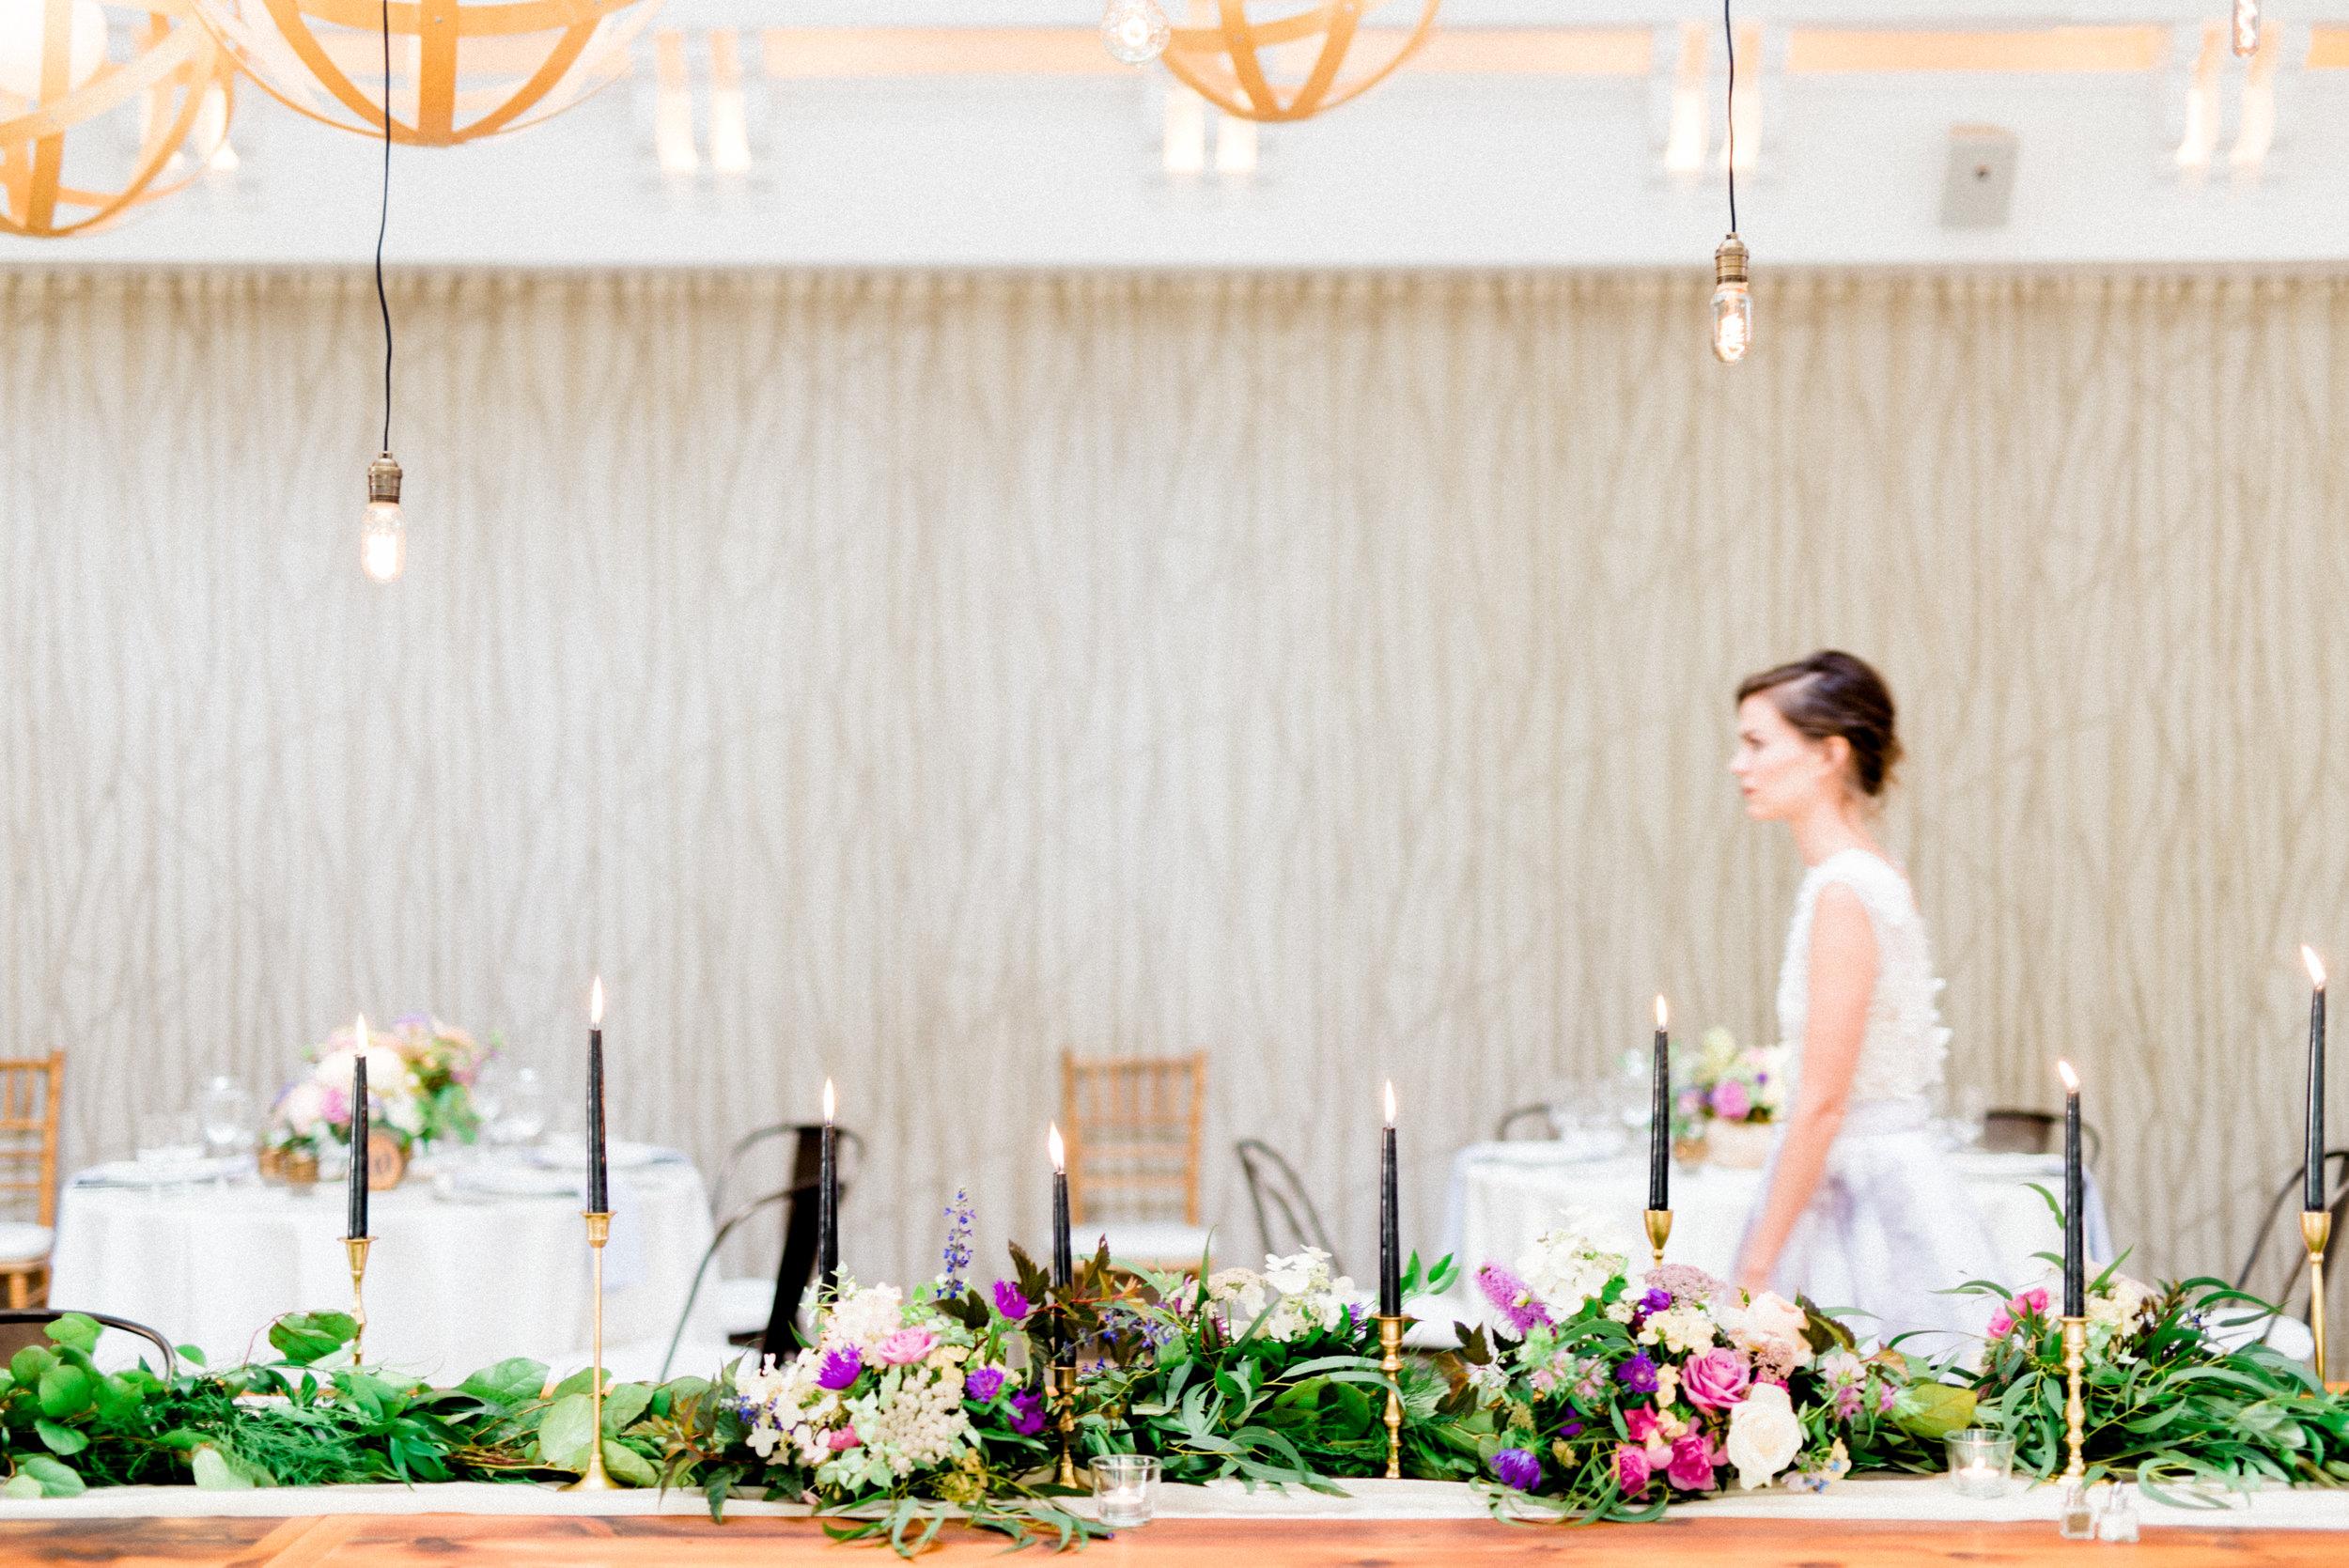 haley-richter-photography-pomme-lavender-wedding-inspiration-057.jpg